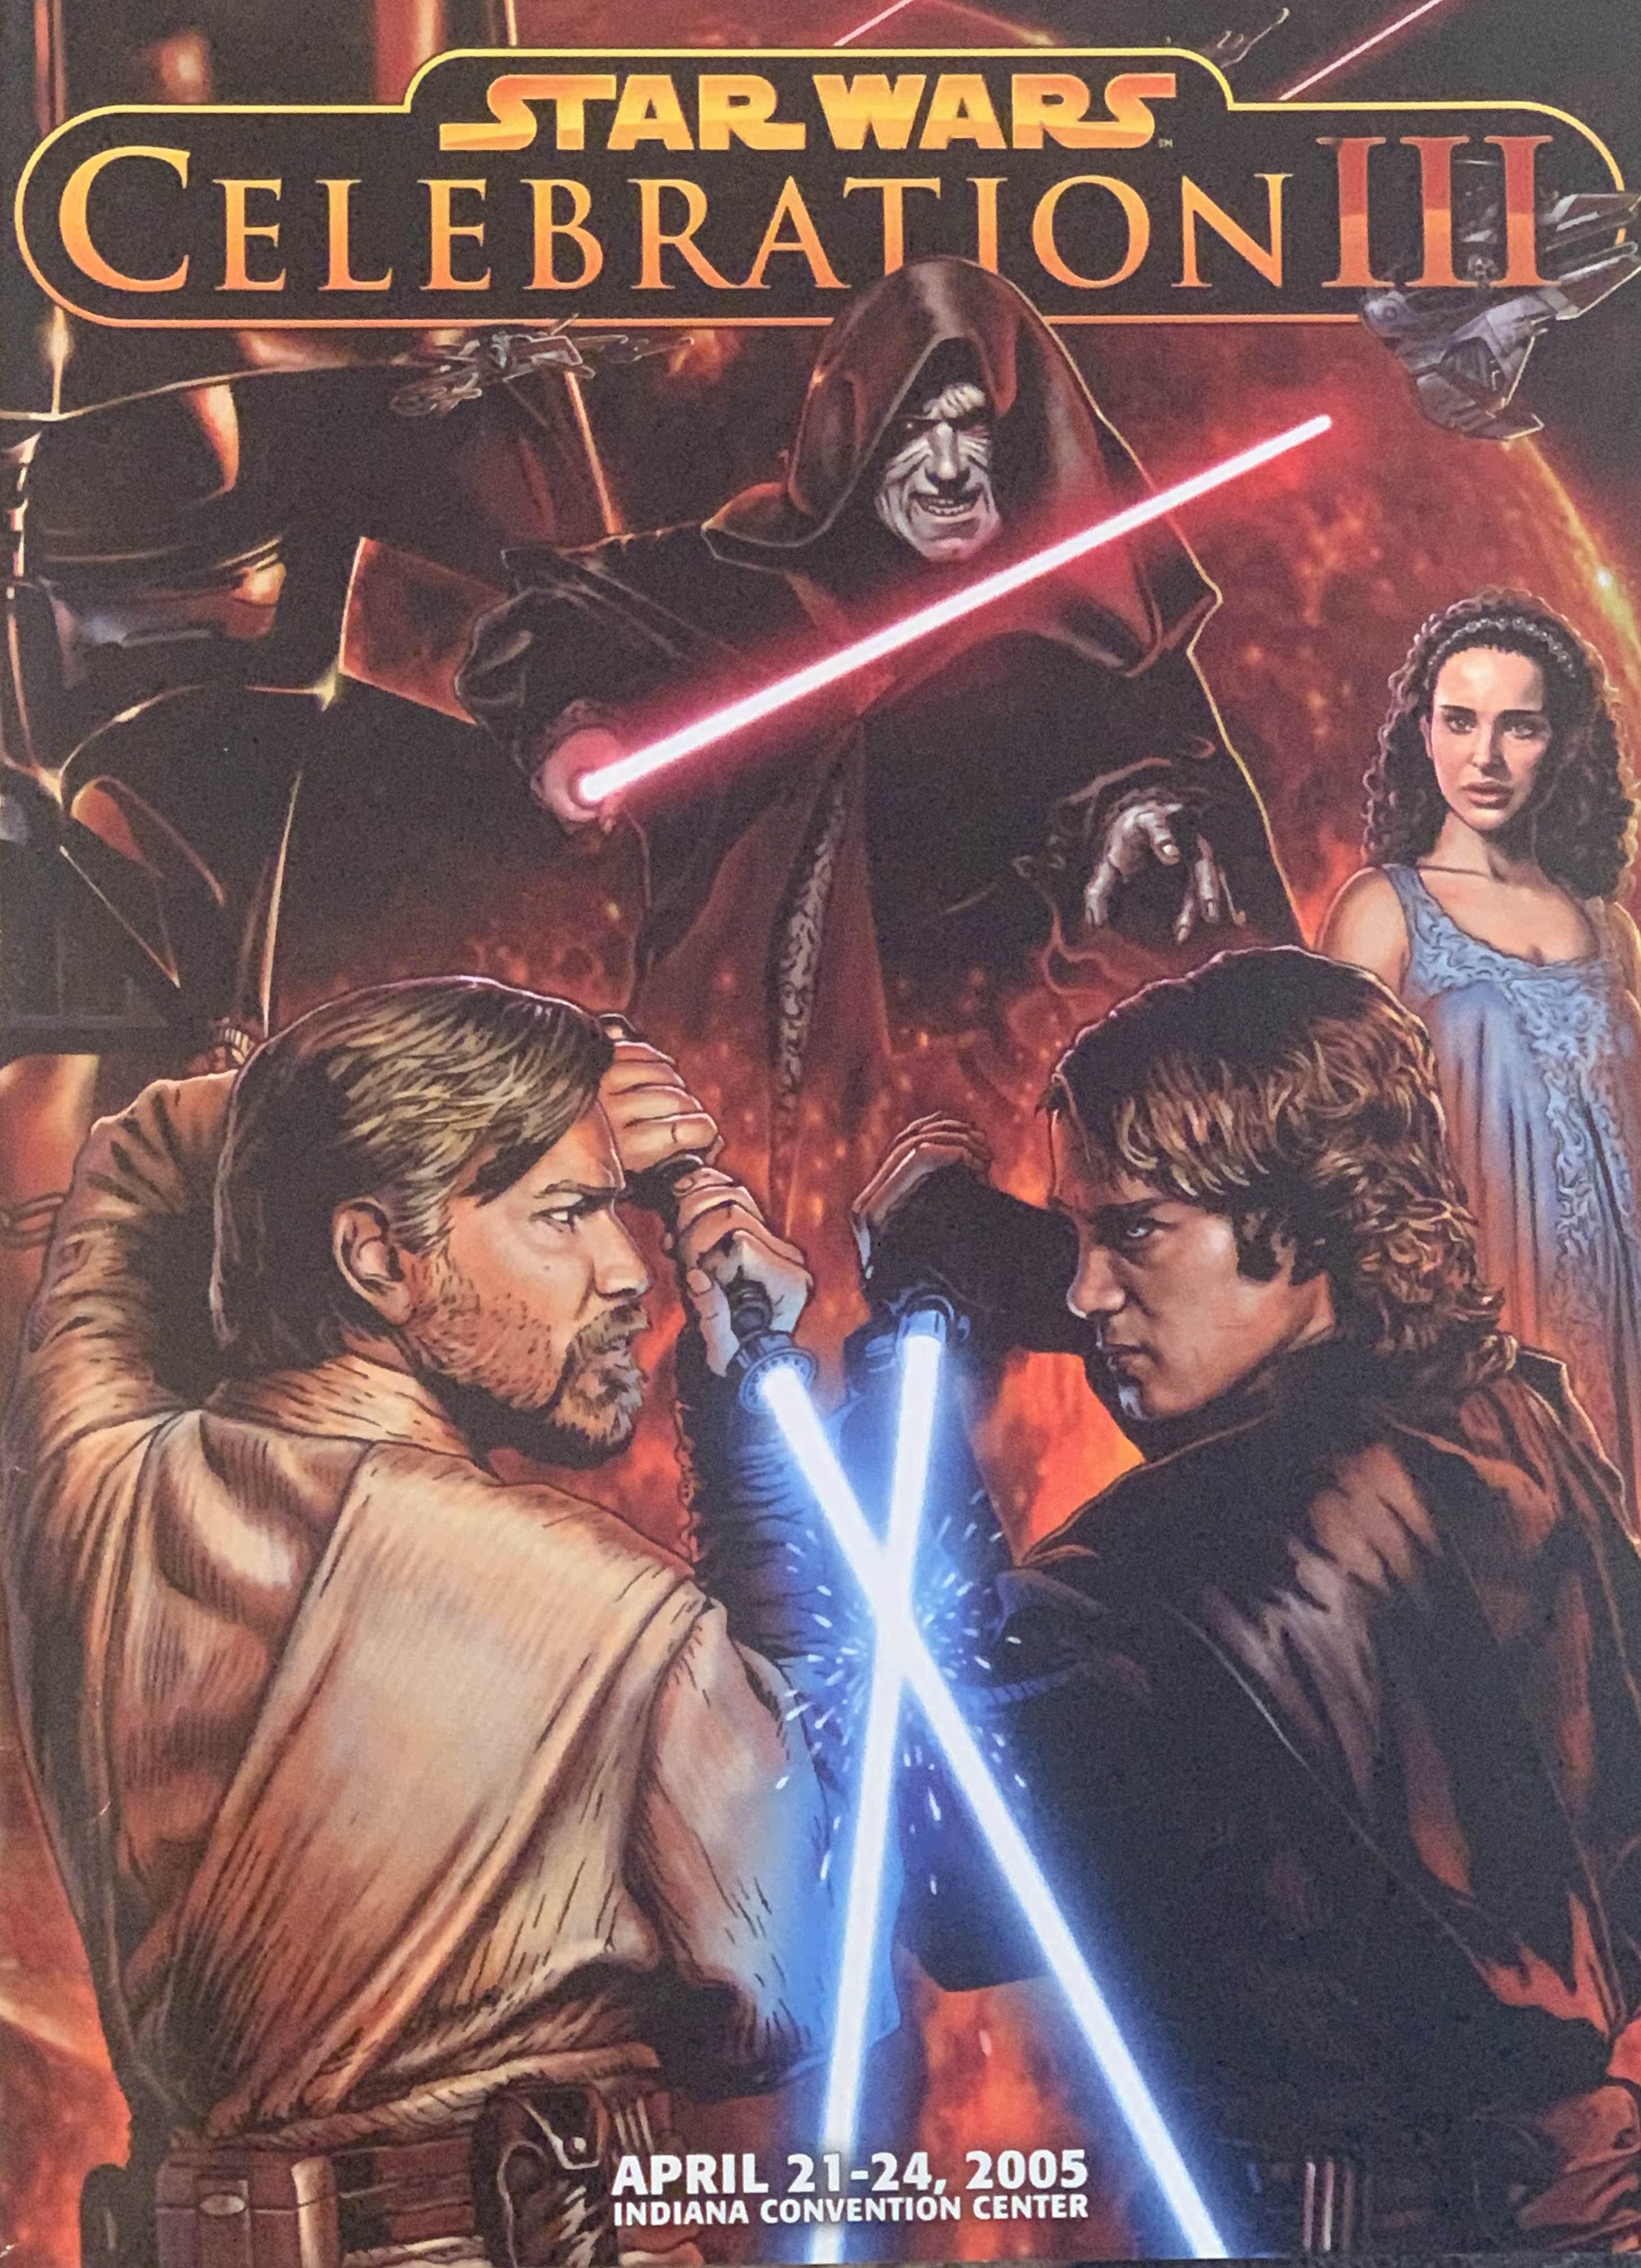 Star Wars Celebration III Souvenir Program